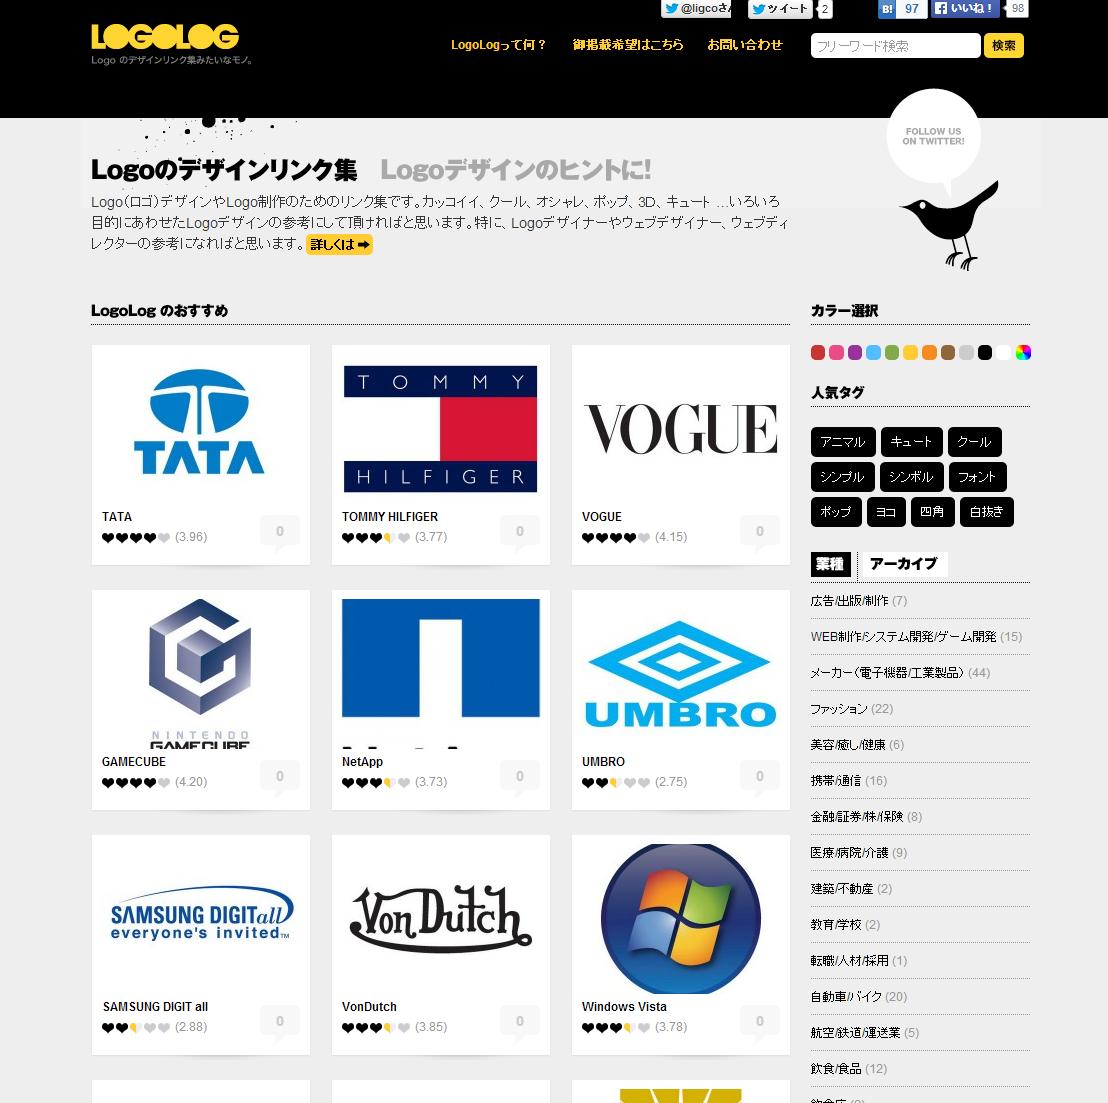 Logolog-ロゴログ│カッコイイ、クール、オシャレなロゴデザインのリンク集・まとめサイト